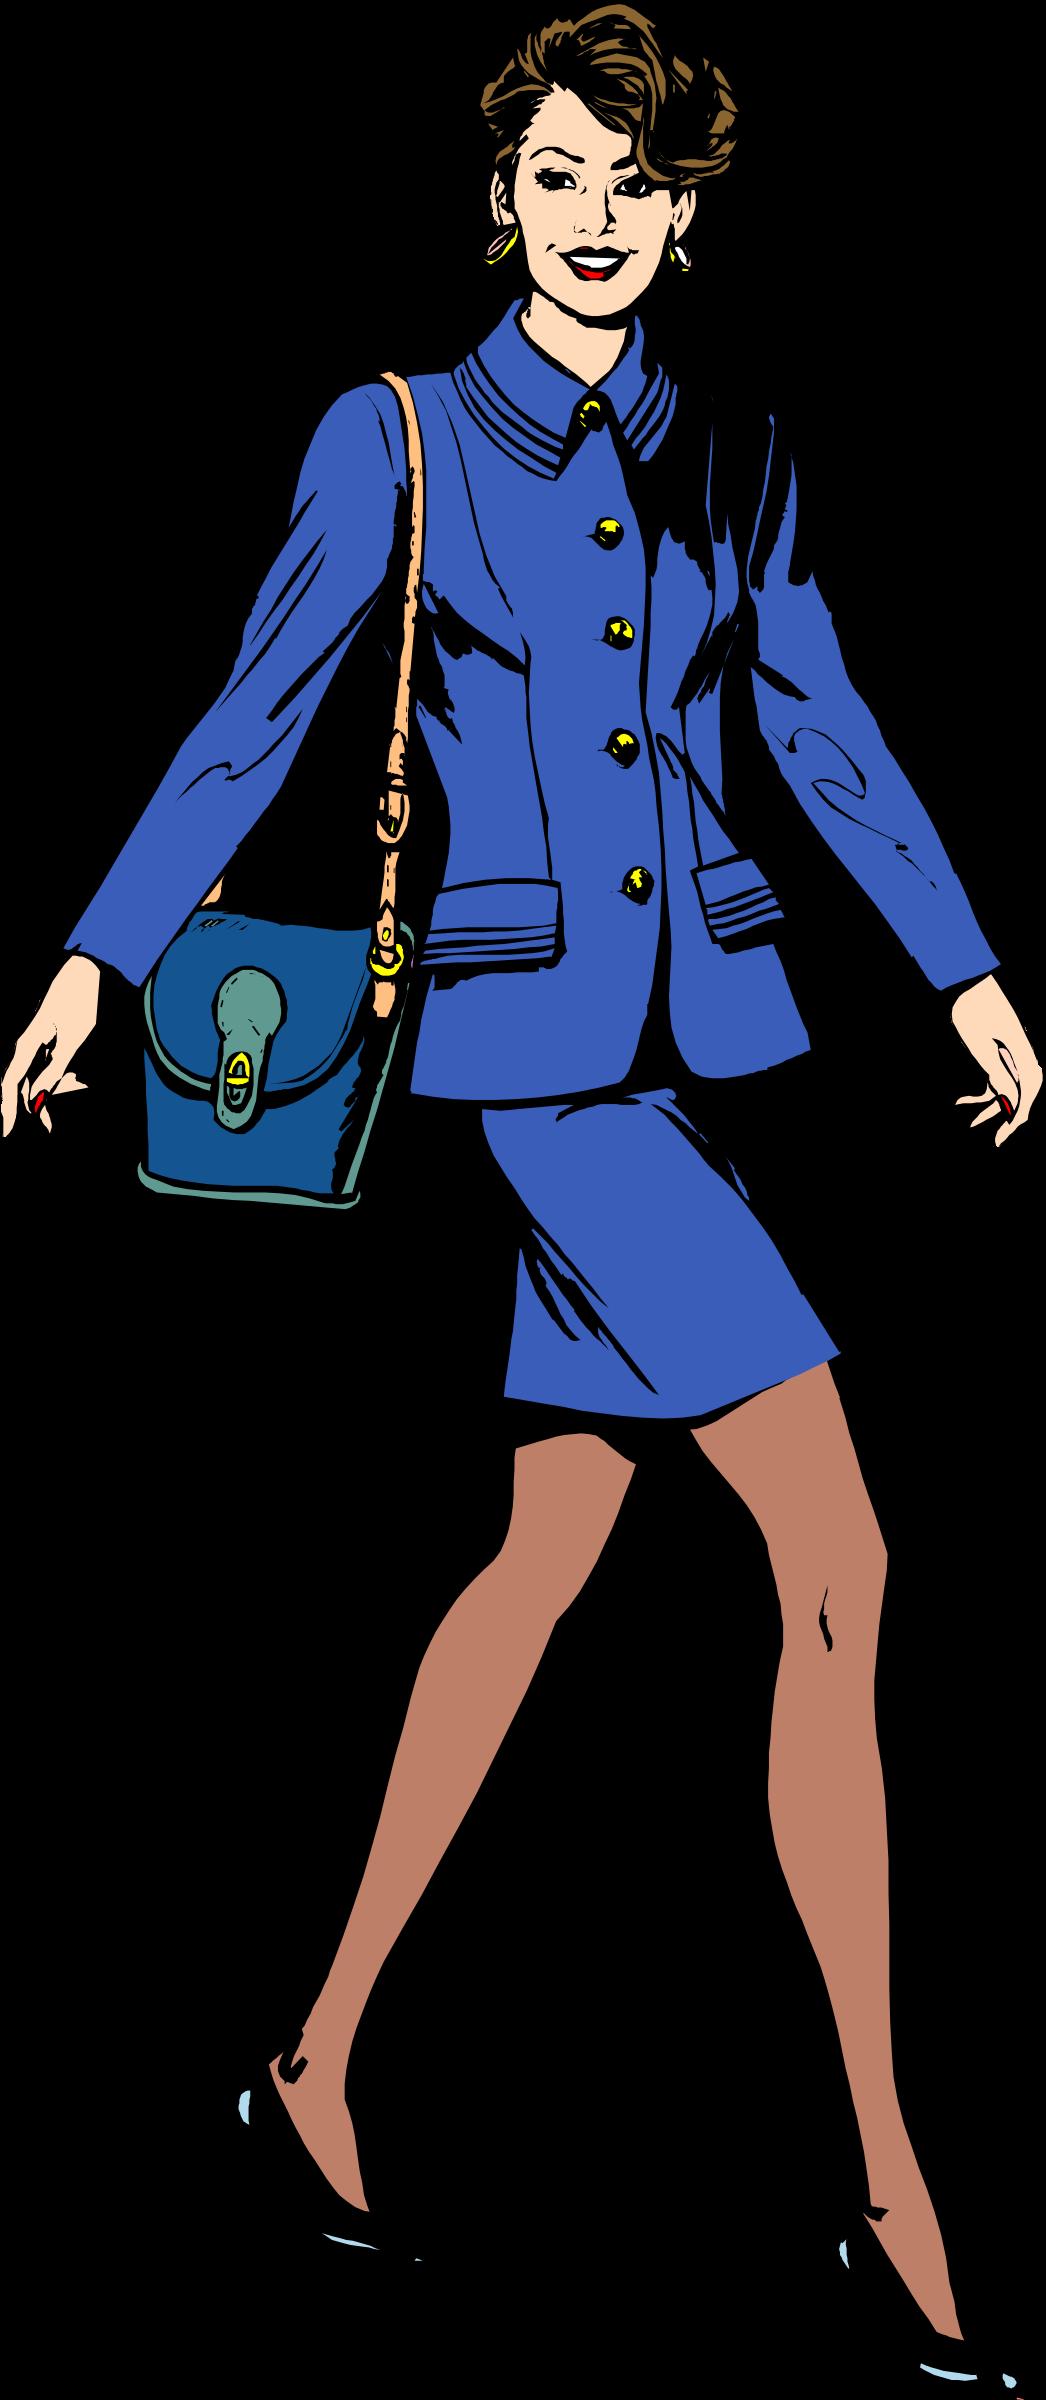 Businesswoman clipart person. Business woman big image